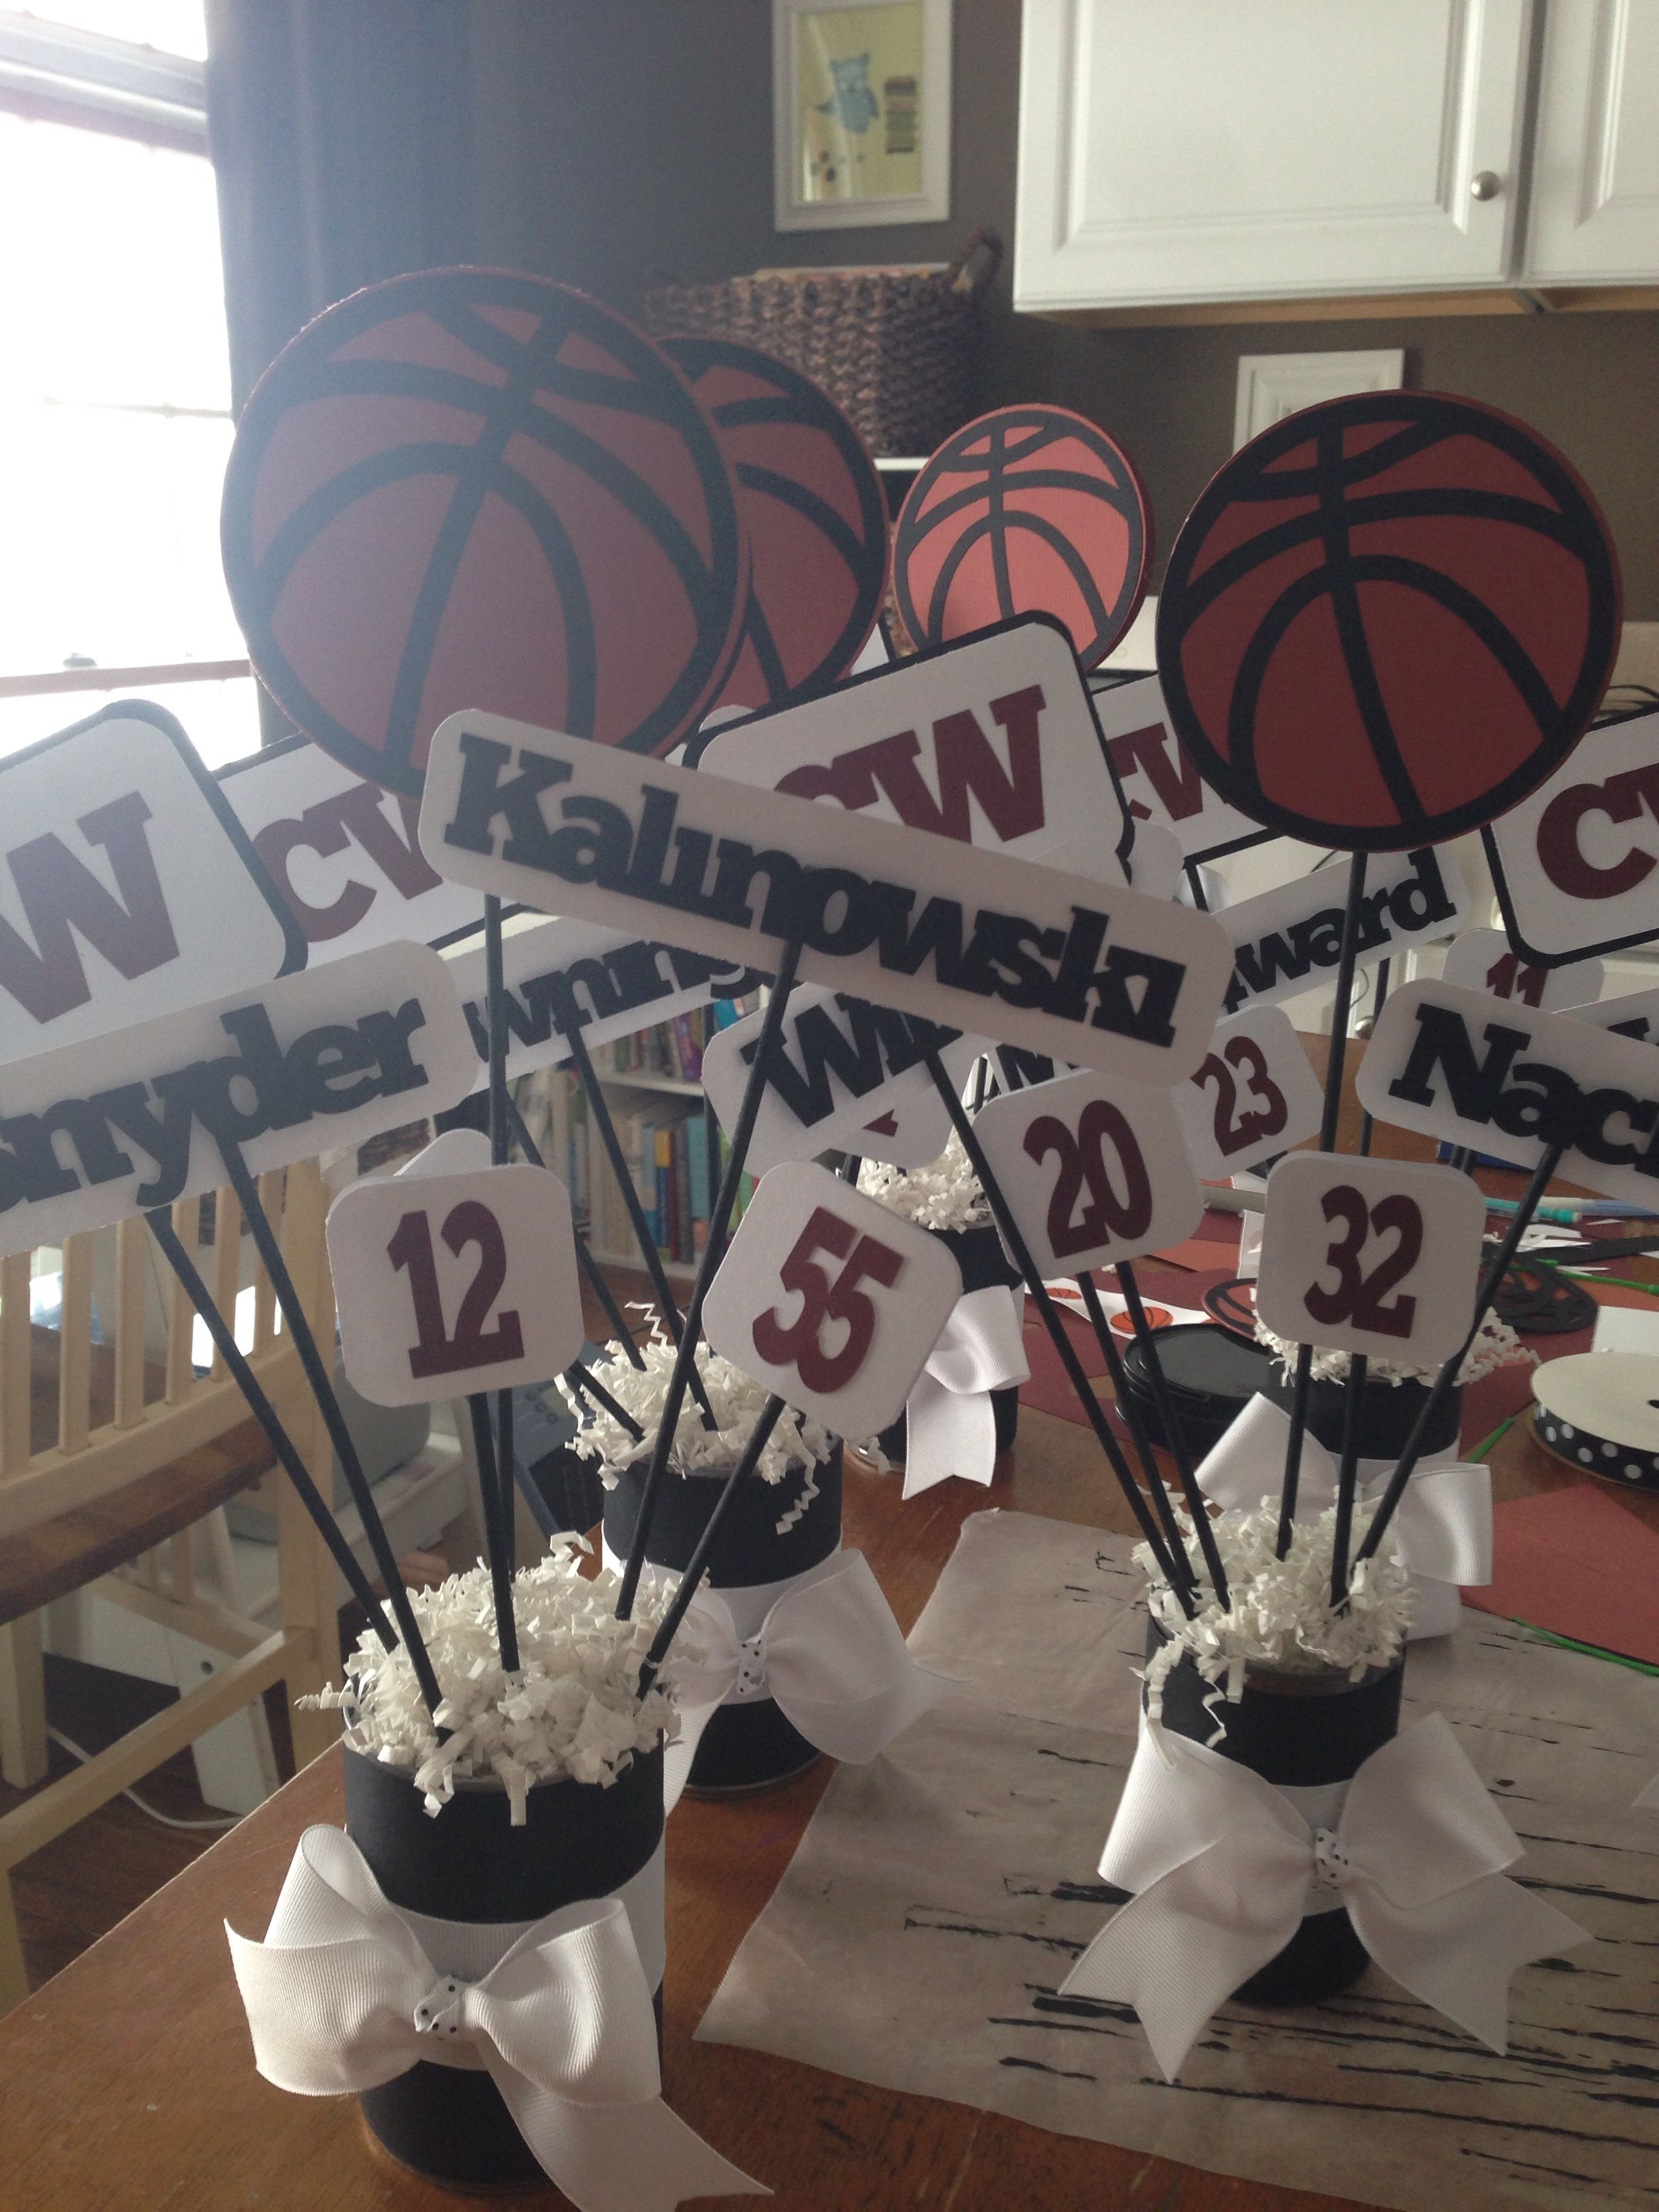 Basketball football cheer cheerleading banquet dinner